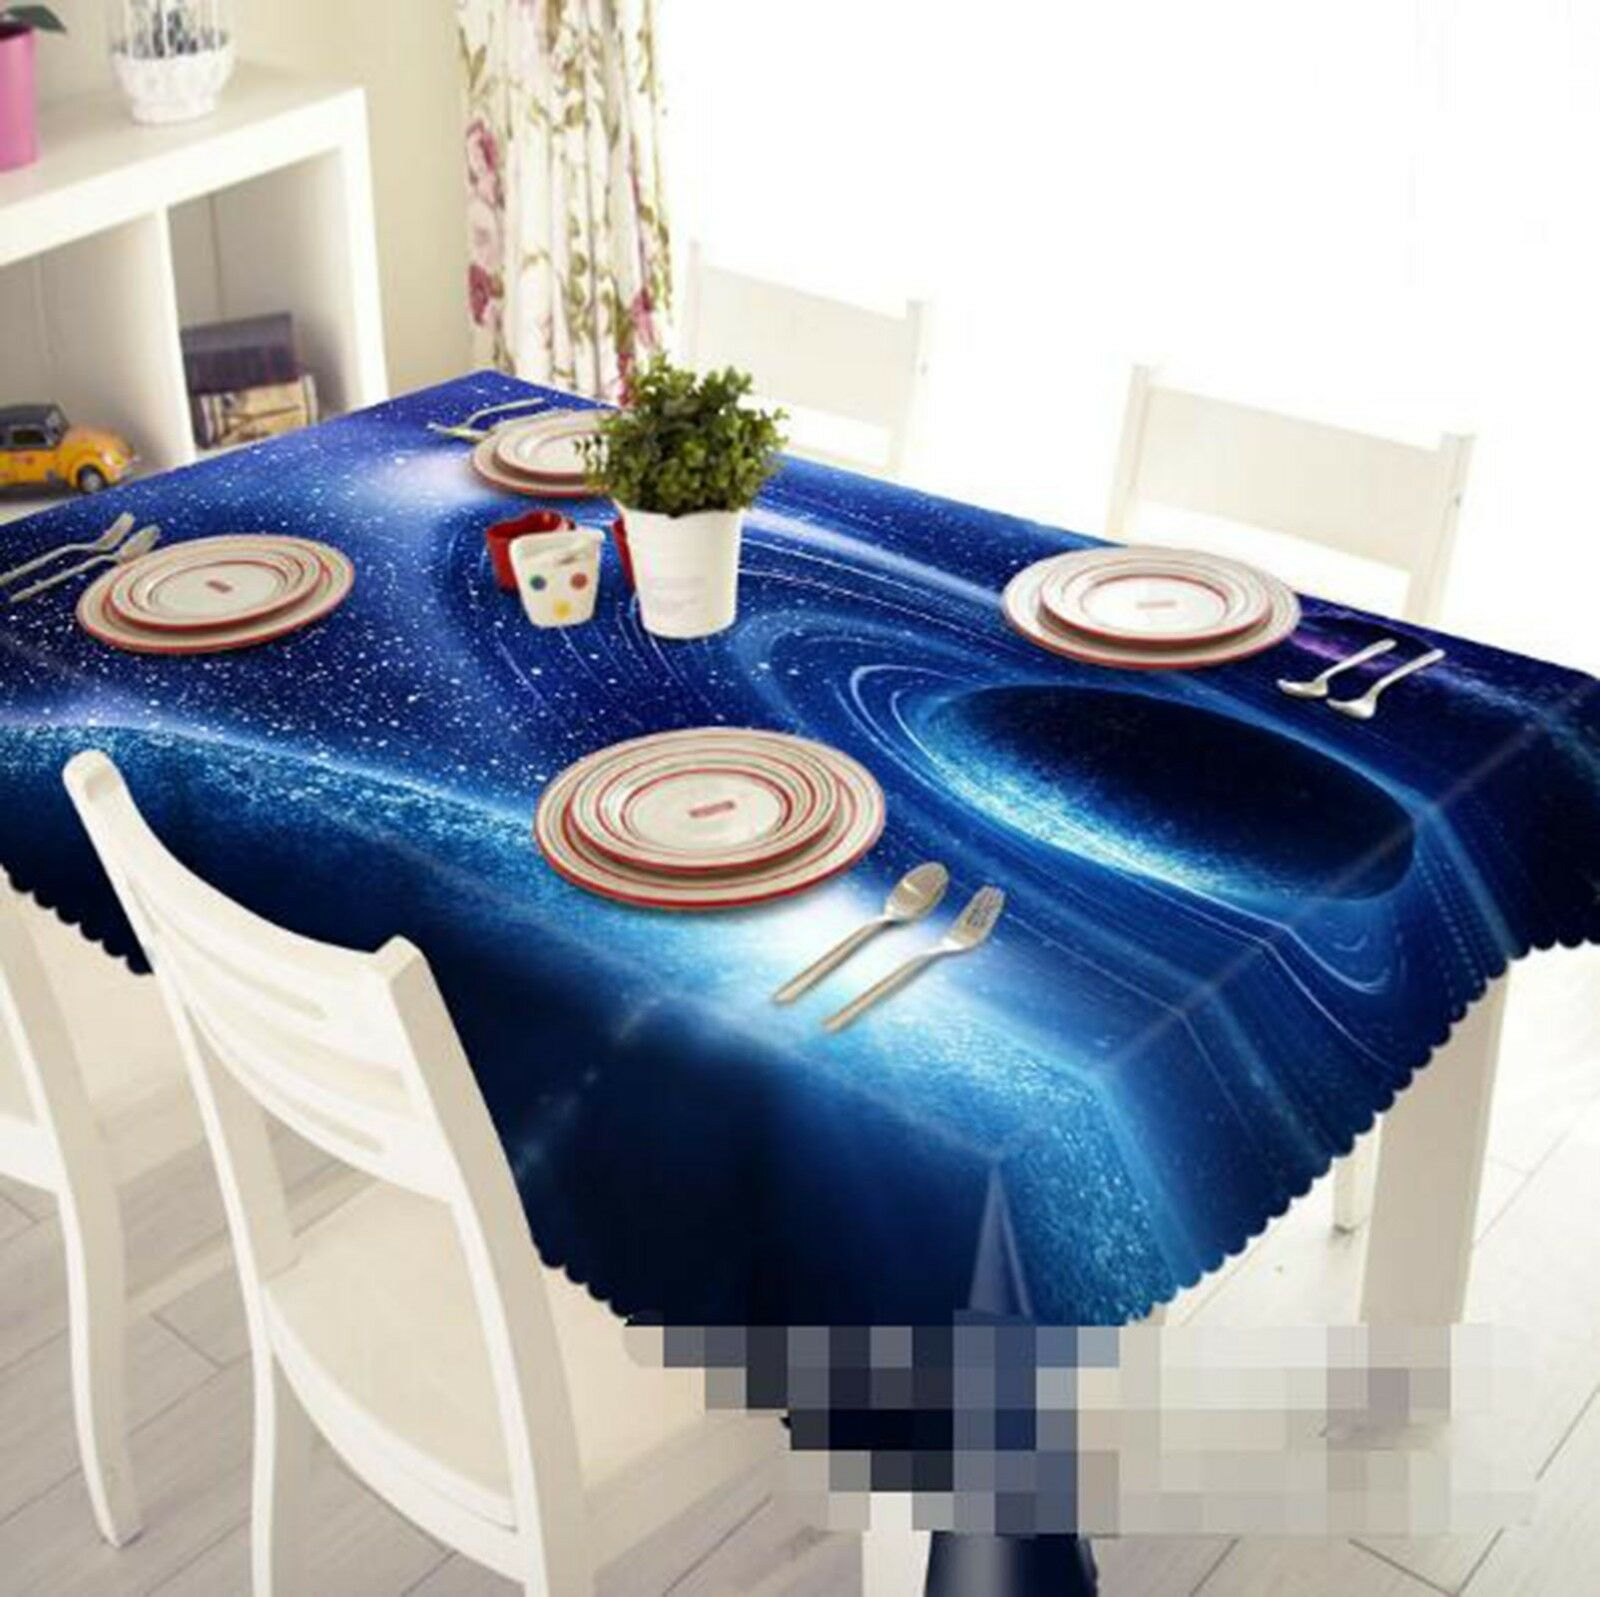 3D bleu Whirlpool 05 Tablecloth Table Cover Cloth Birthday Party Event AJ Lemon